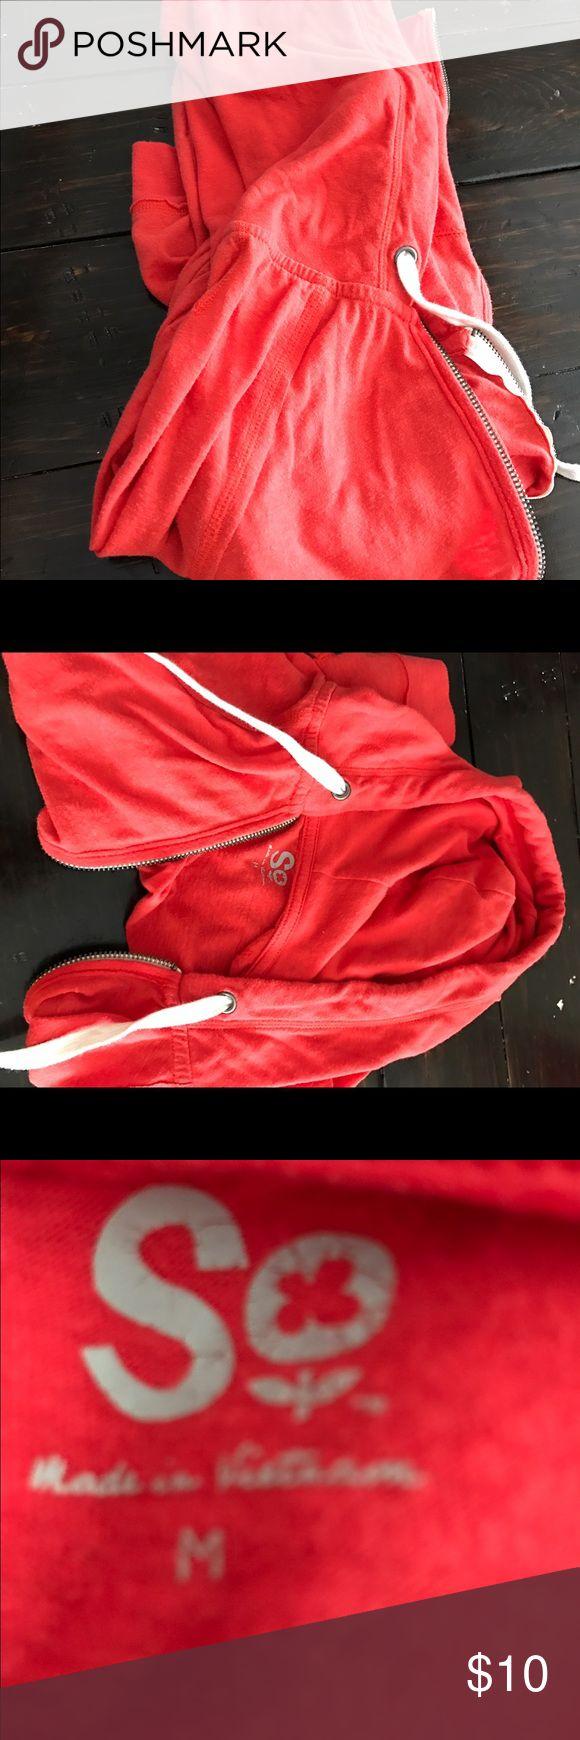 So red zip up hoodie size m Cute good condition Tops Sweatshirts & Hoodies